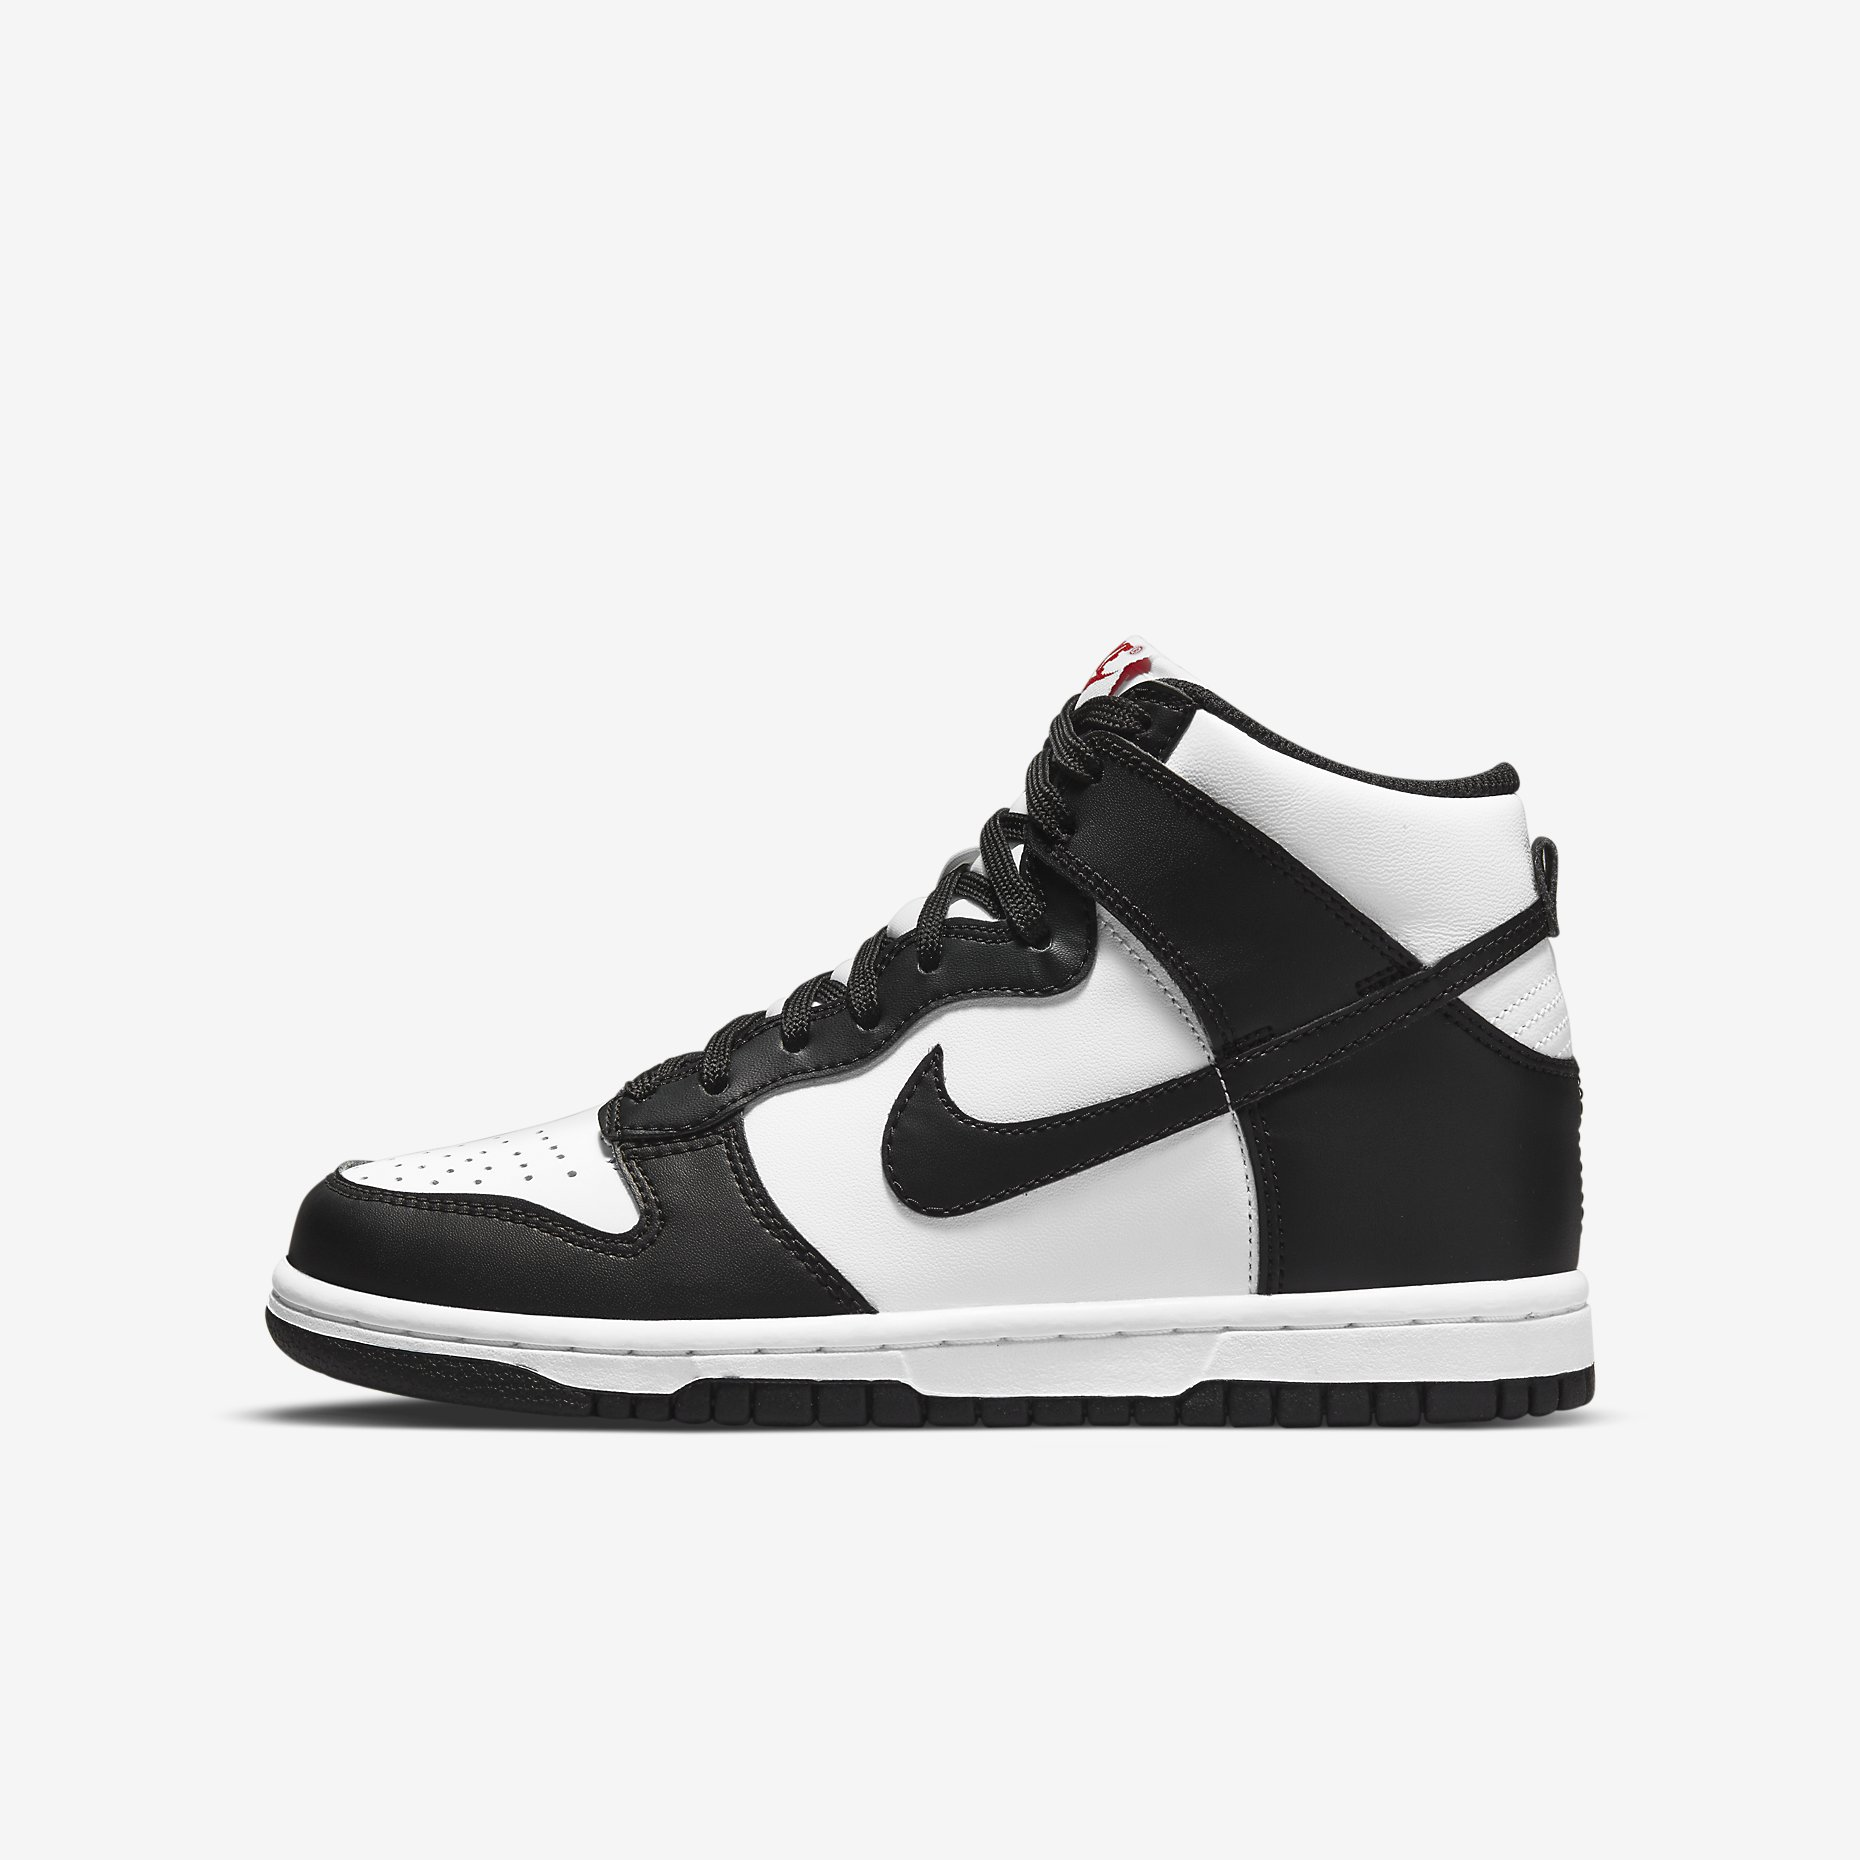 Nike Dunk High GS 'White/Black'}